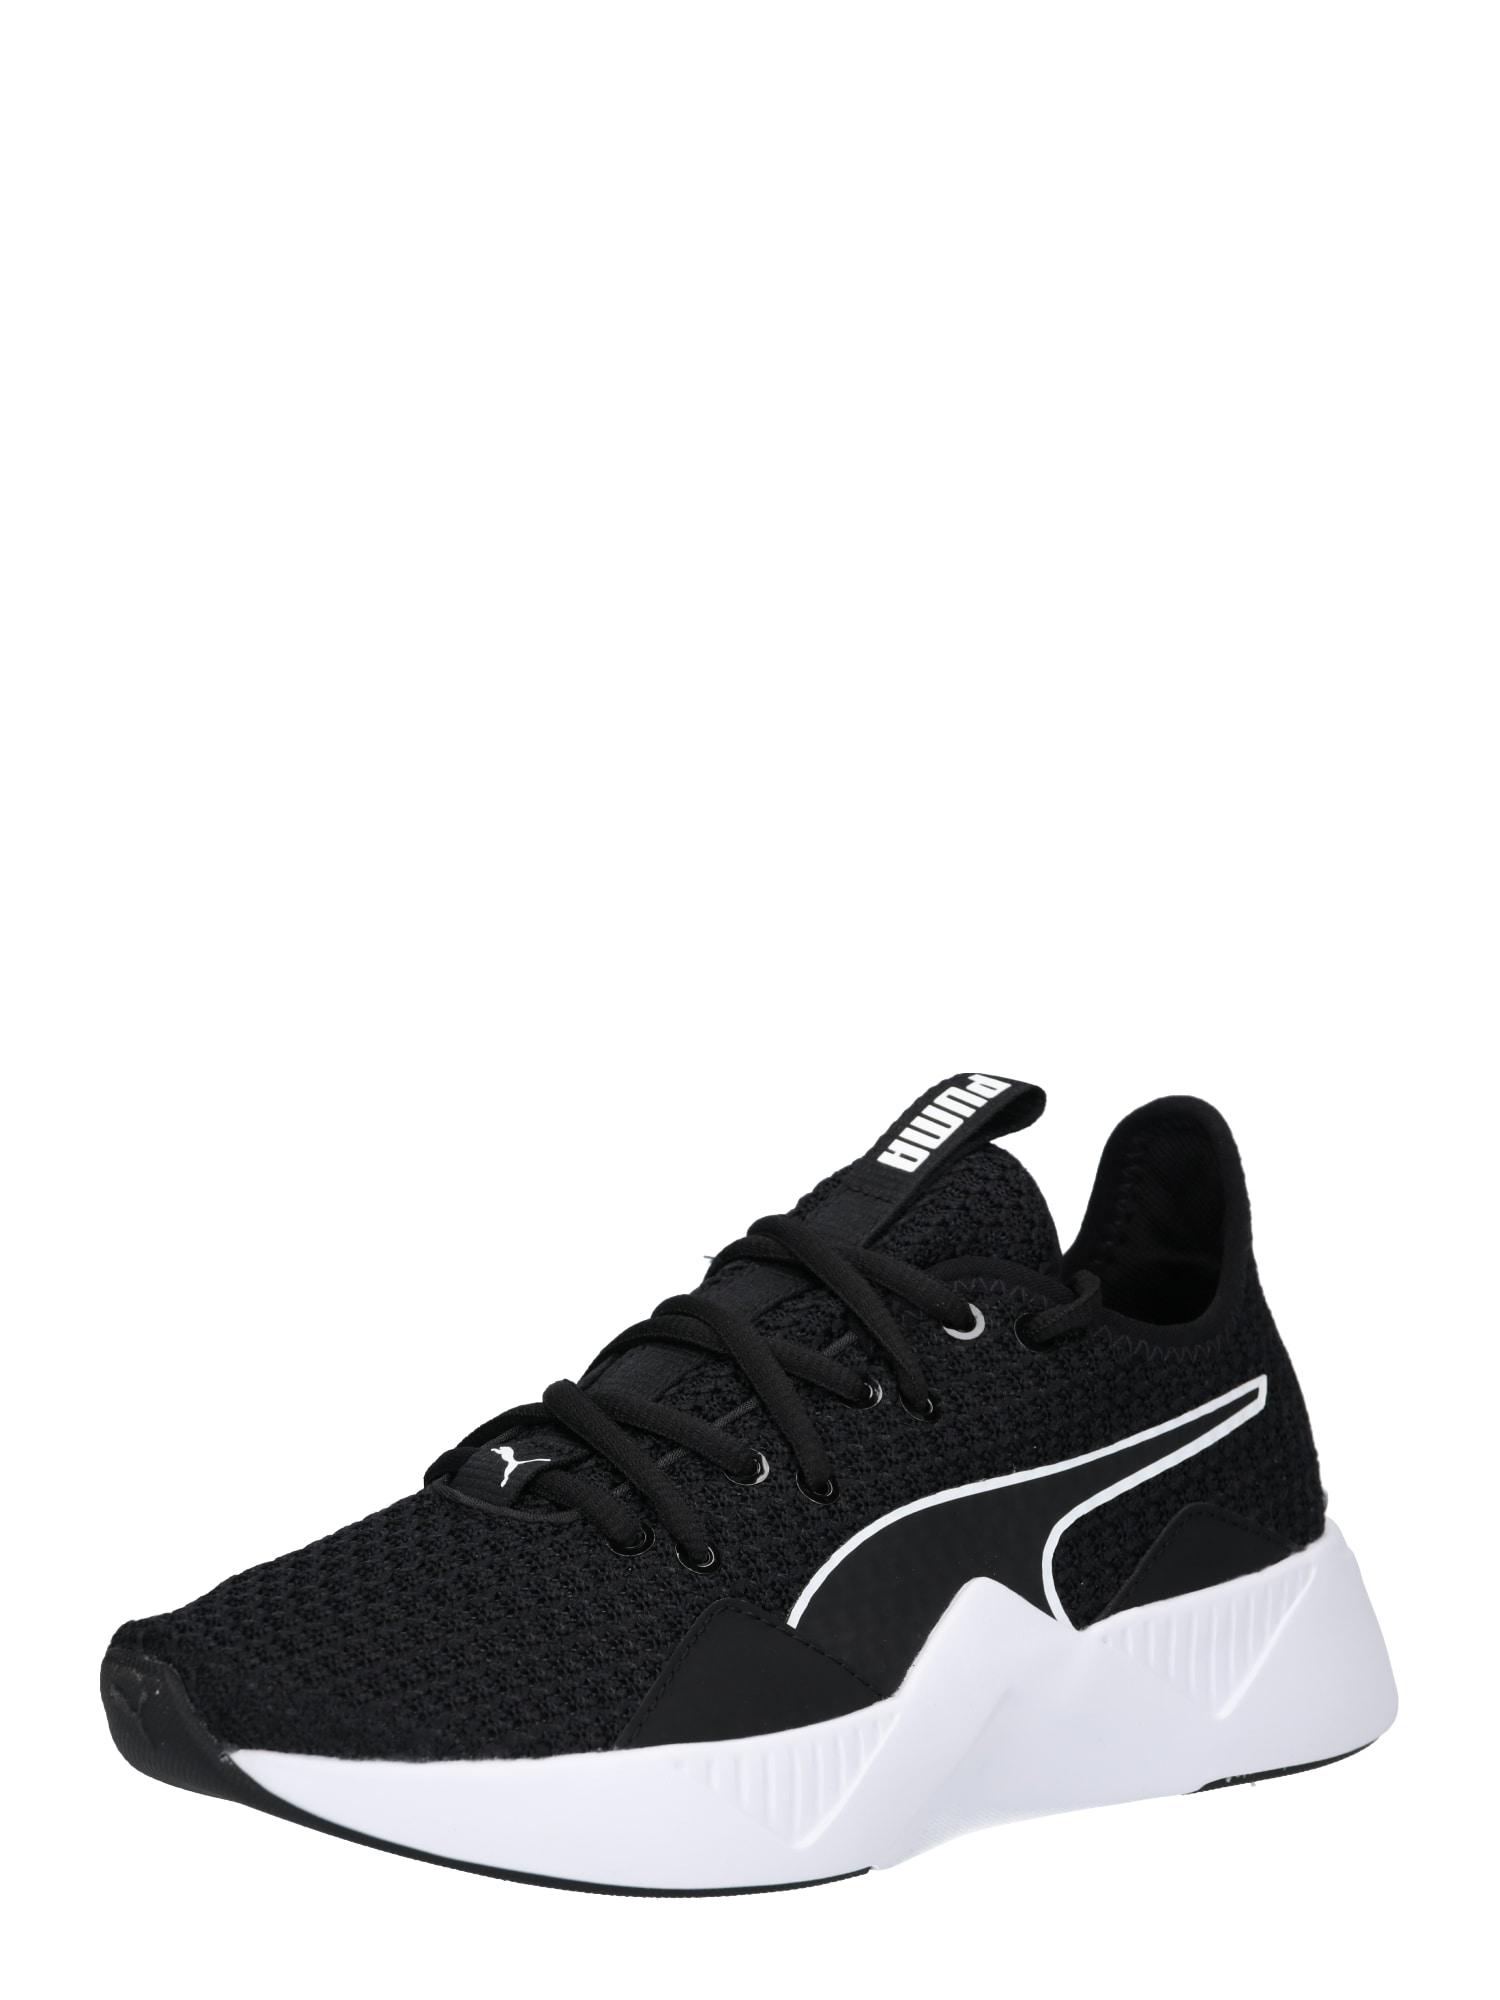 Sportovní boty Incite FS Wns černá bílá PUMA